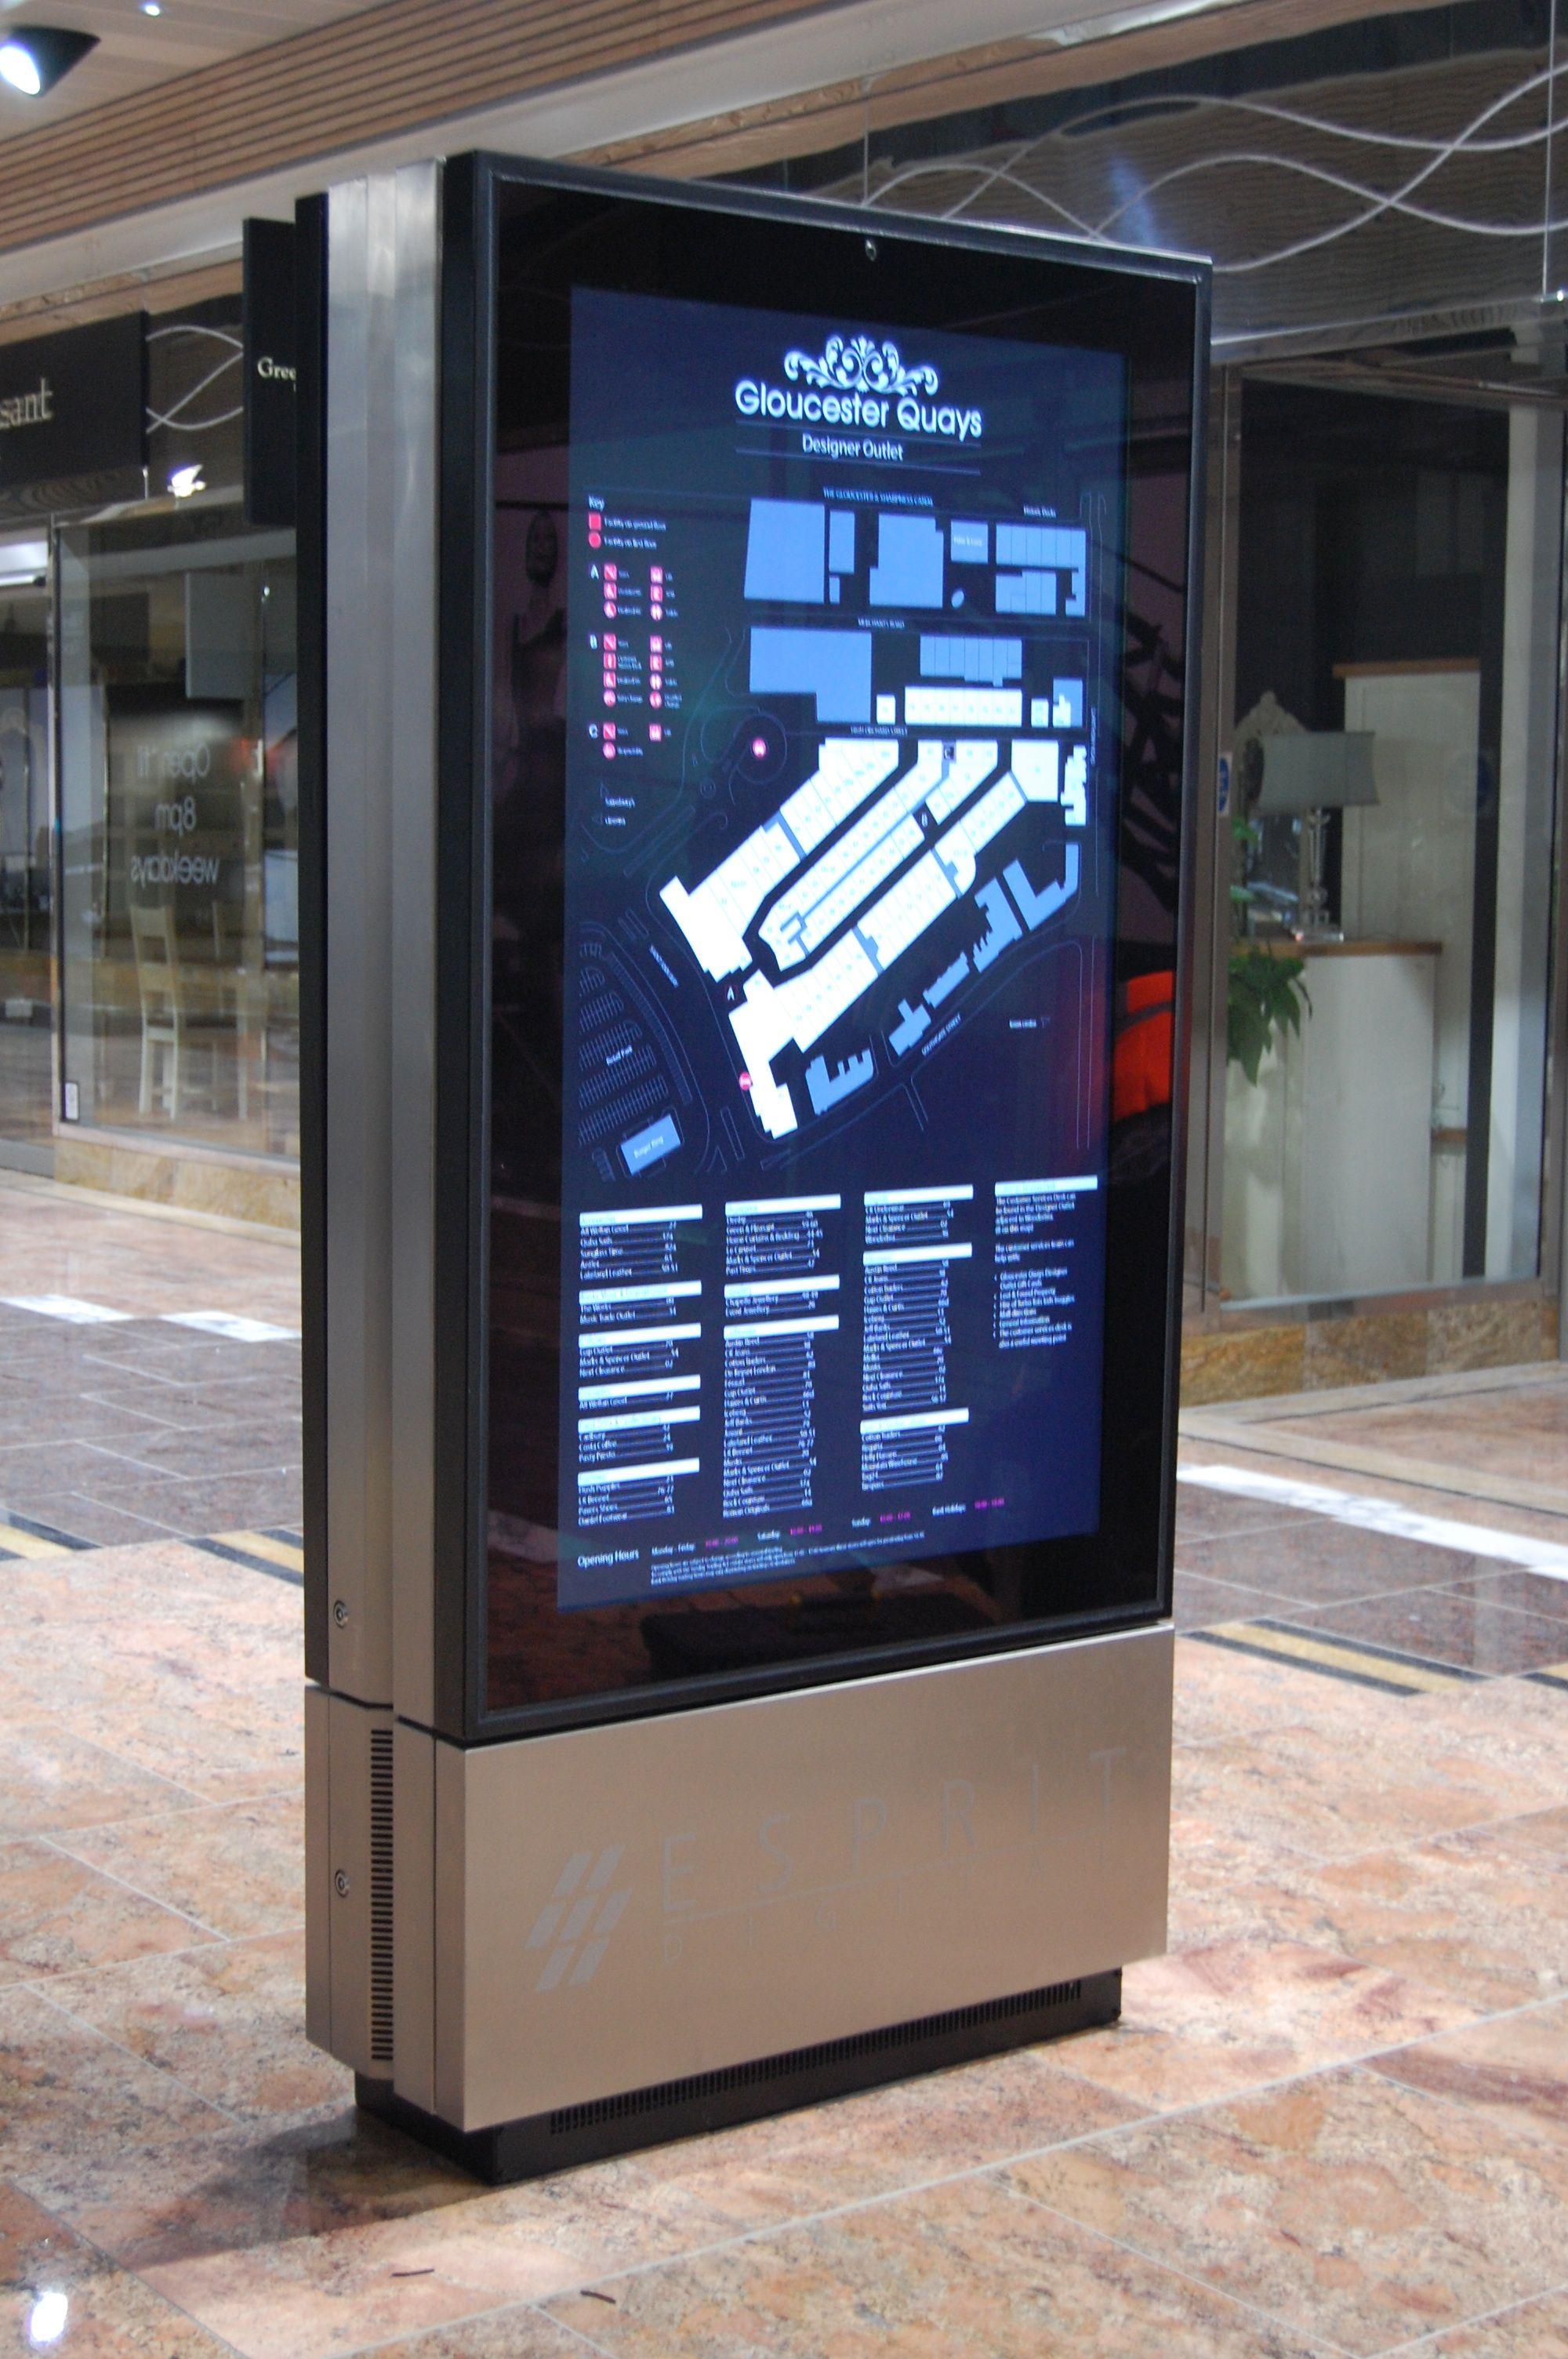 Kiosk Digital Signage Display